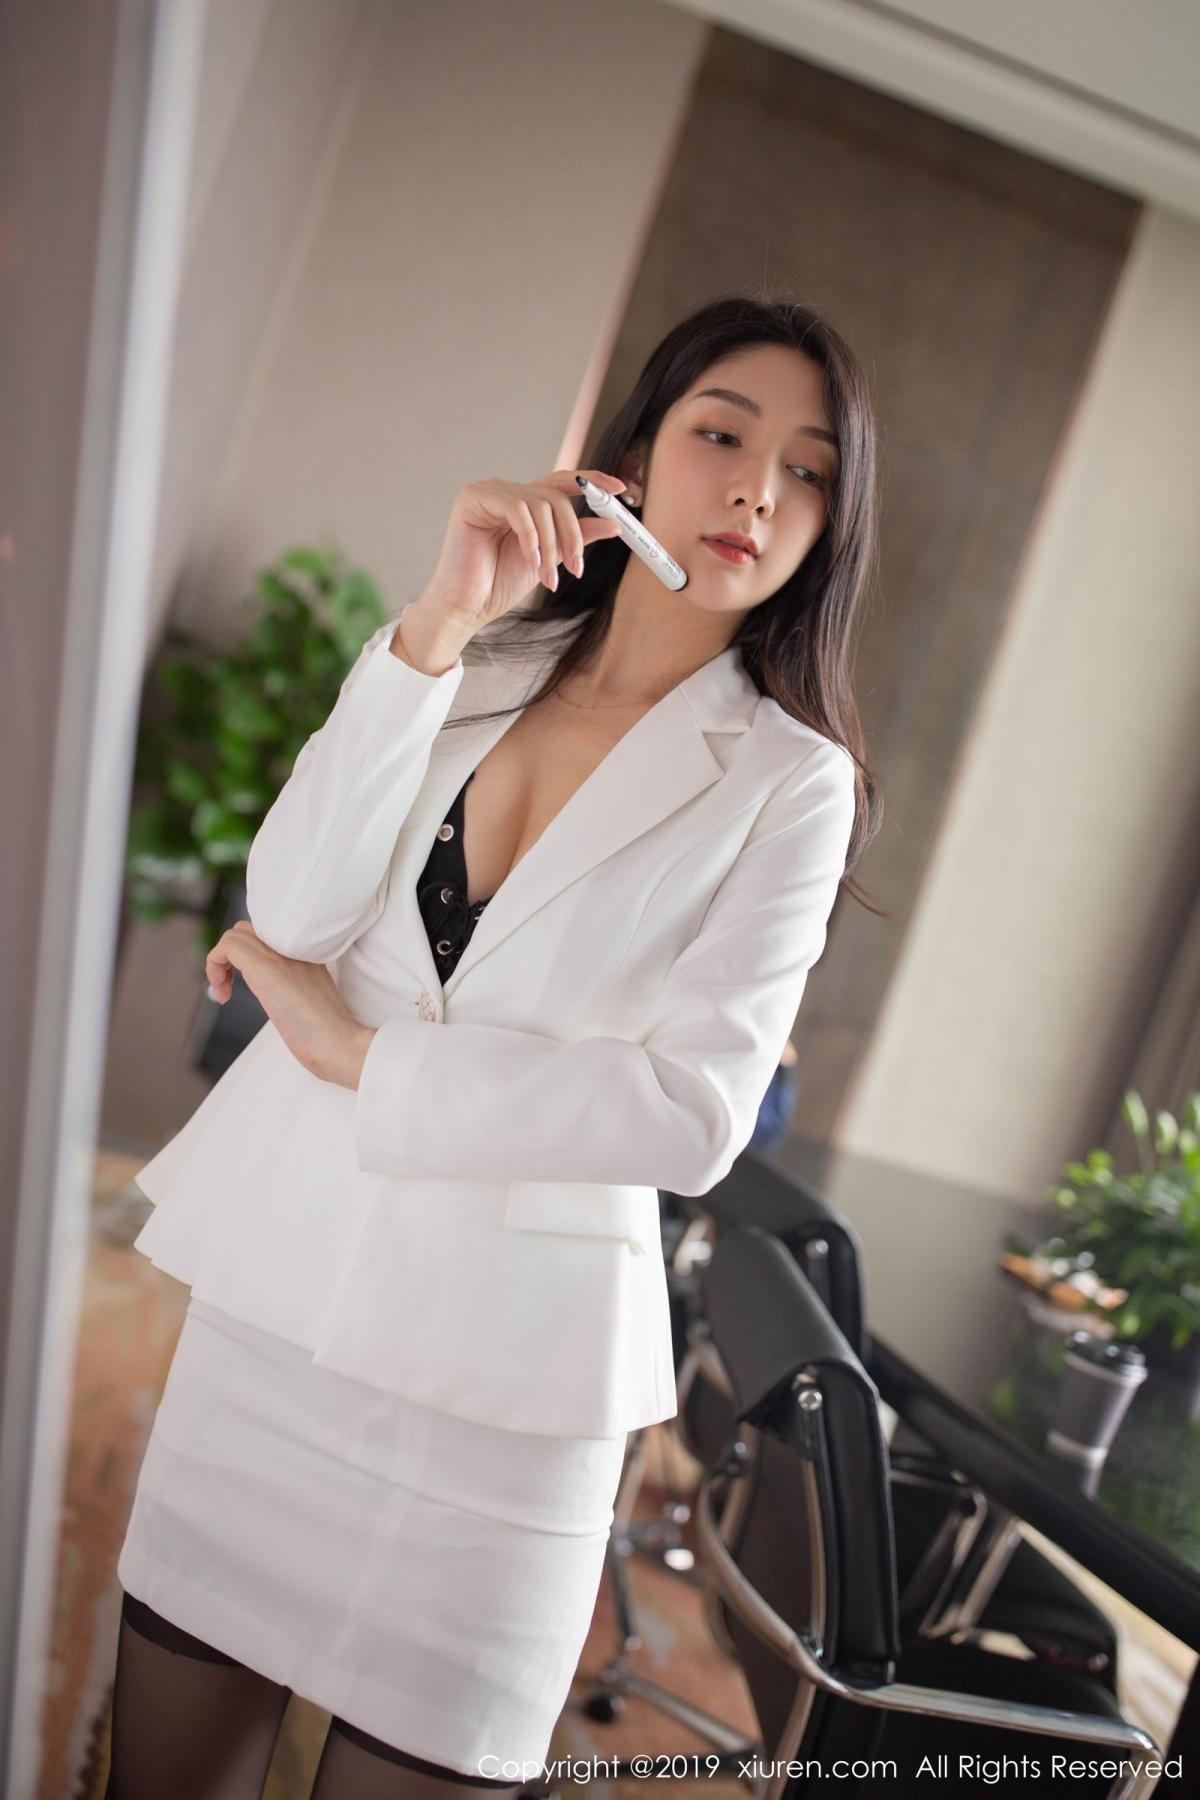 [XiuRen] Vol.1821 Come to my room and sit after you get off work 21P, Black Silk, Di Yi, Xiuren